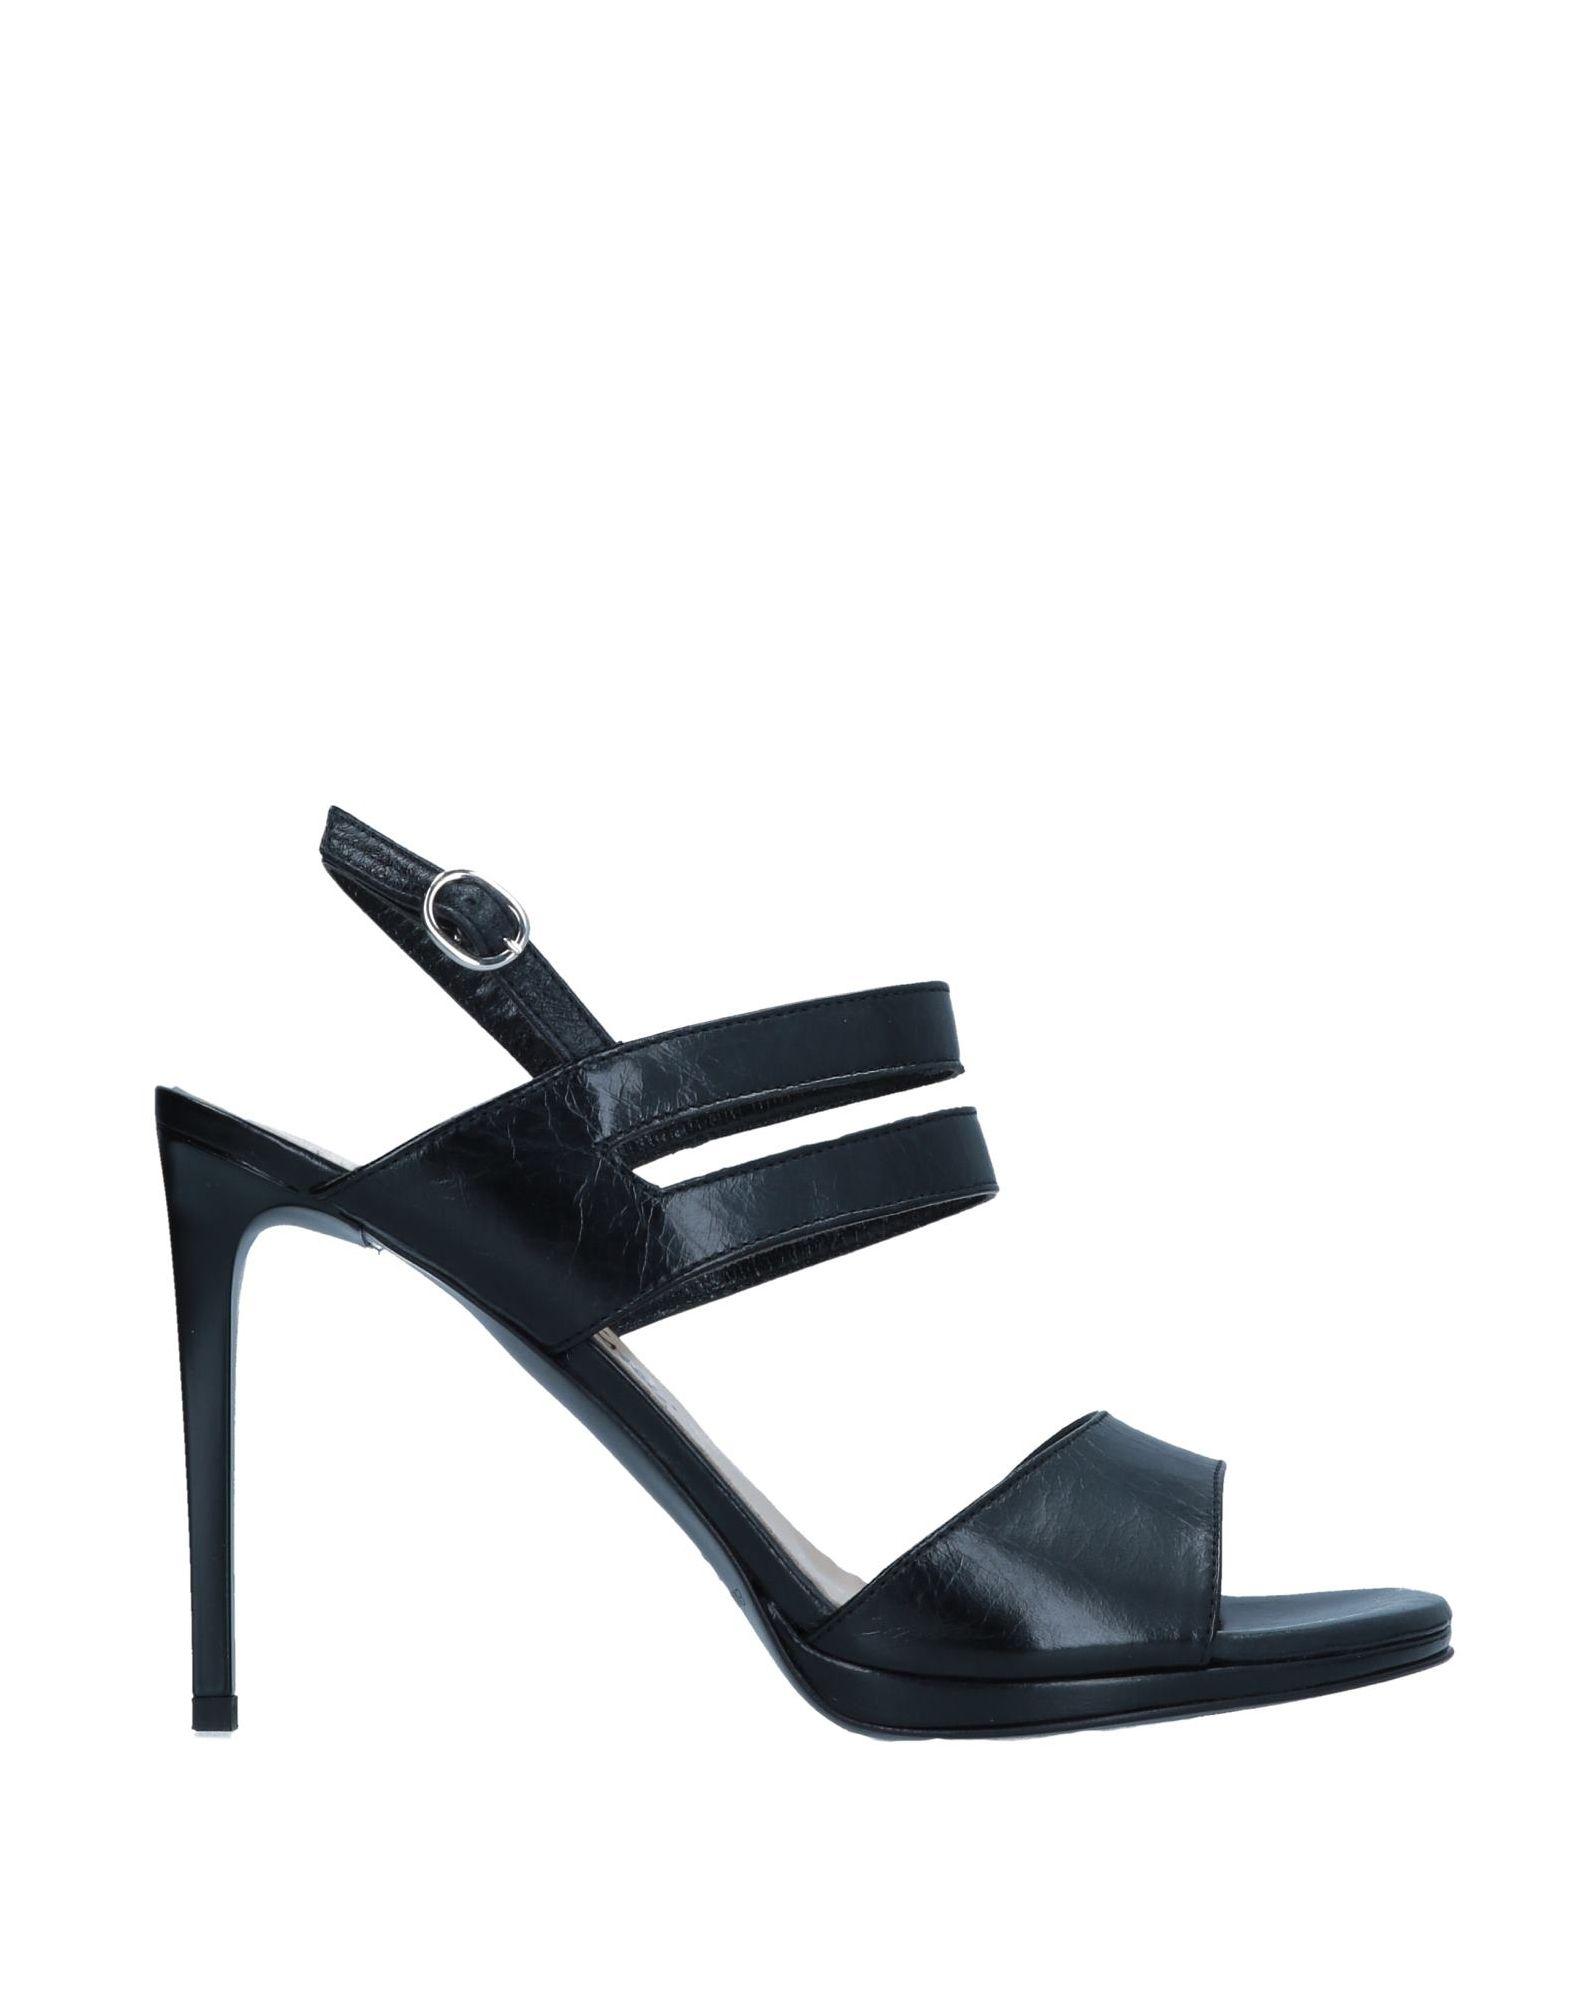 Emanuela Passeri Sandalen Damen  11544059QL Gute Qualität beliebte Schuhe